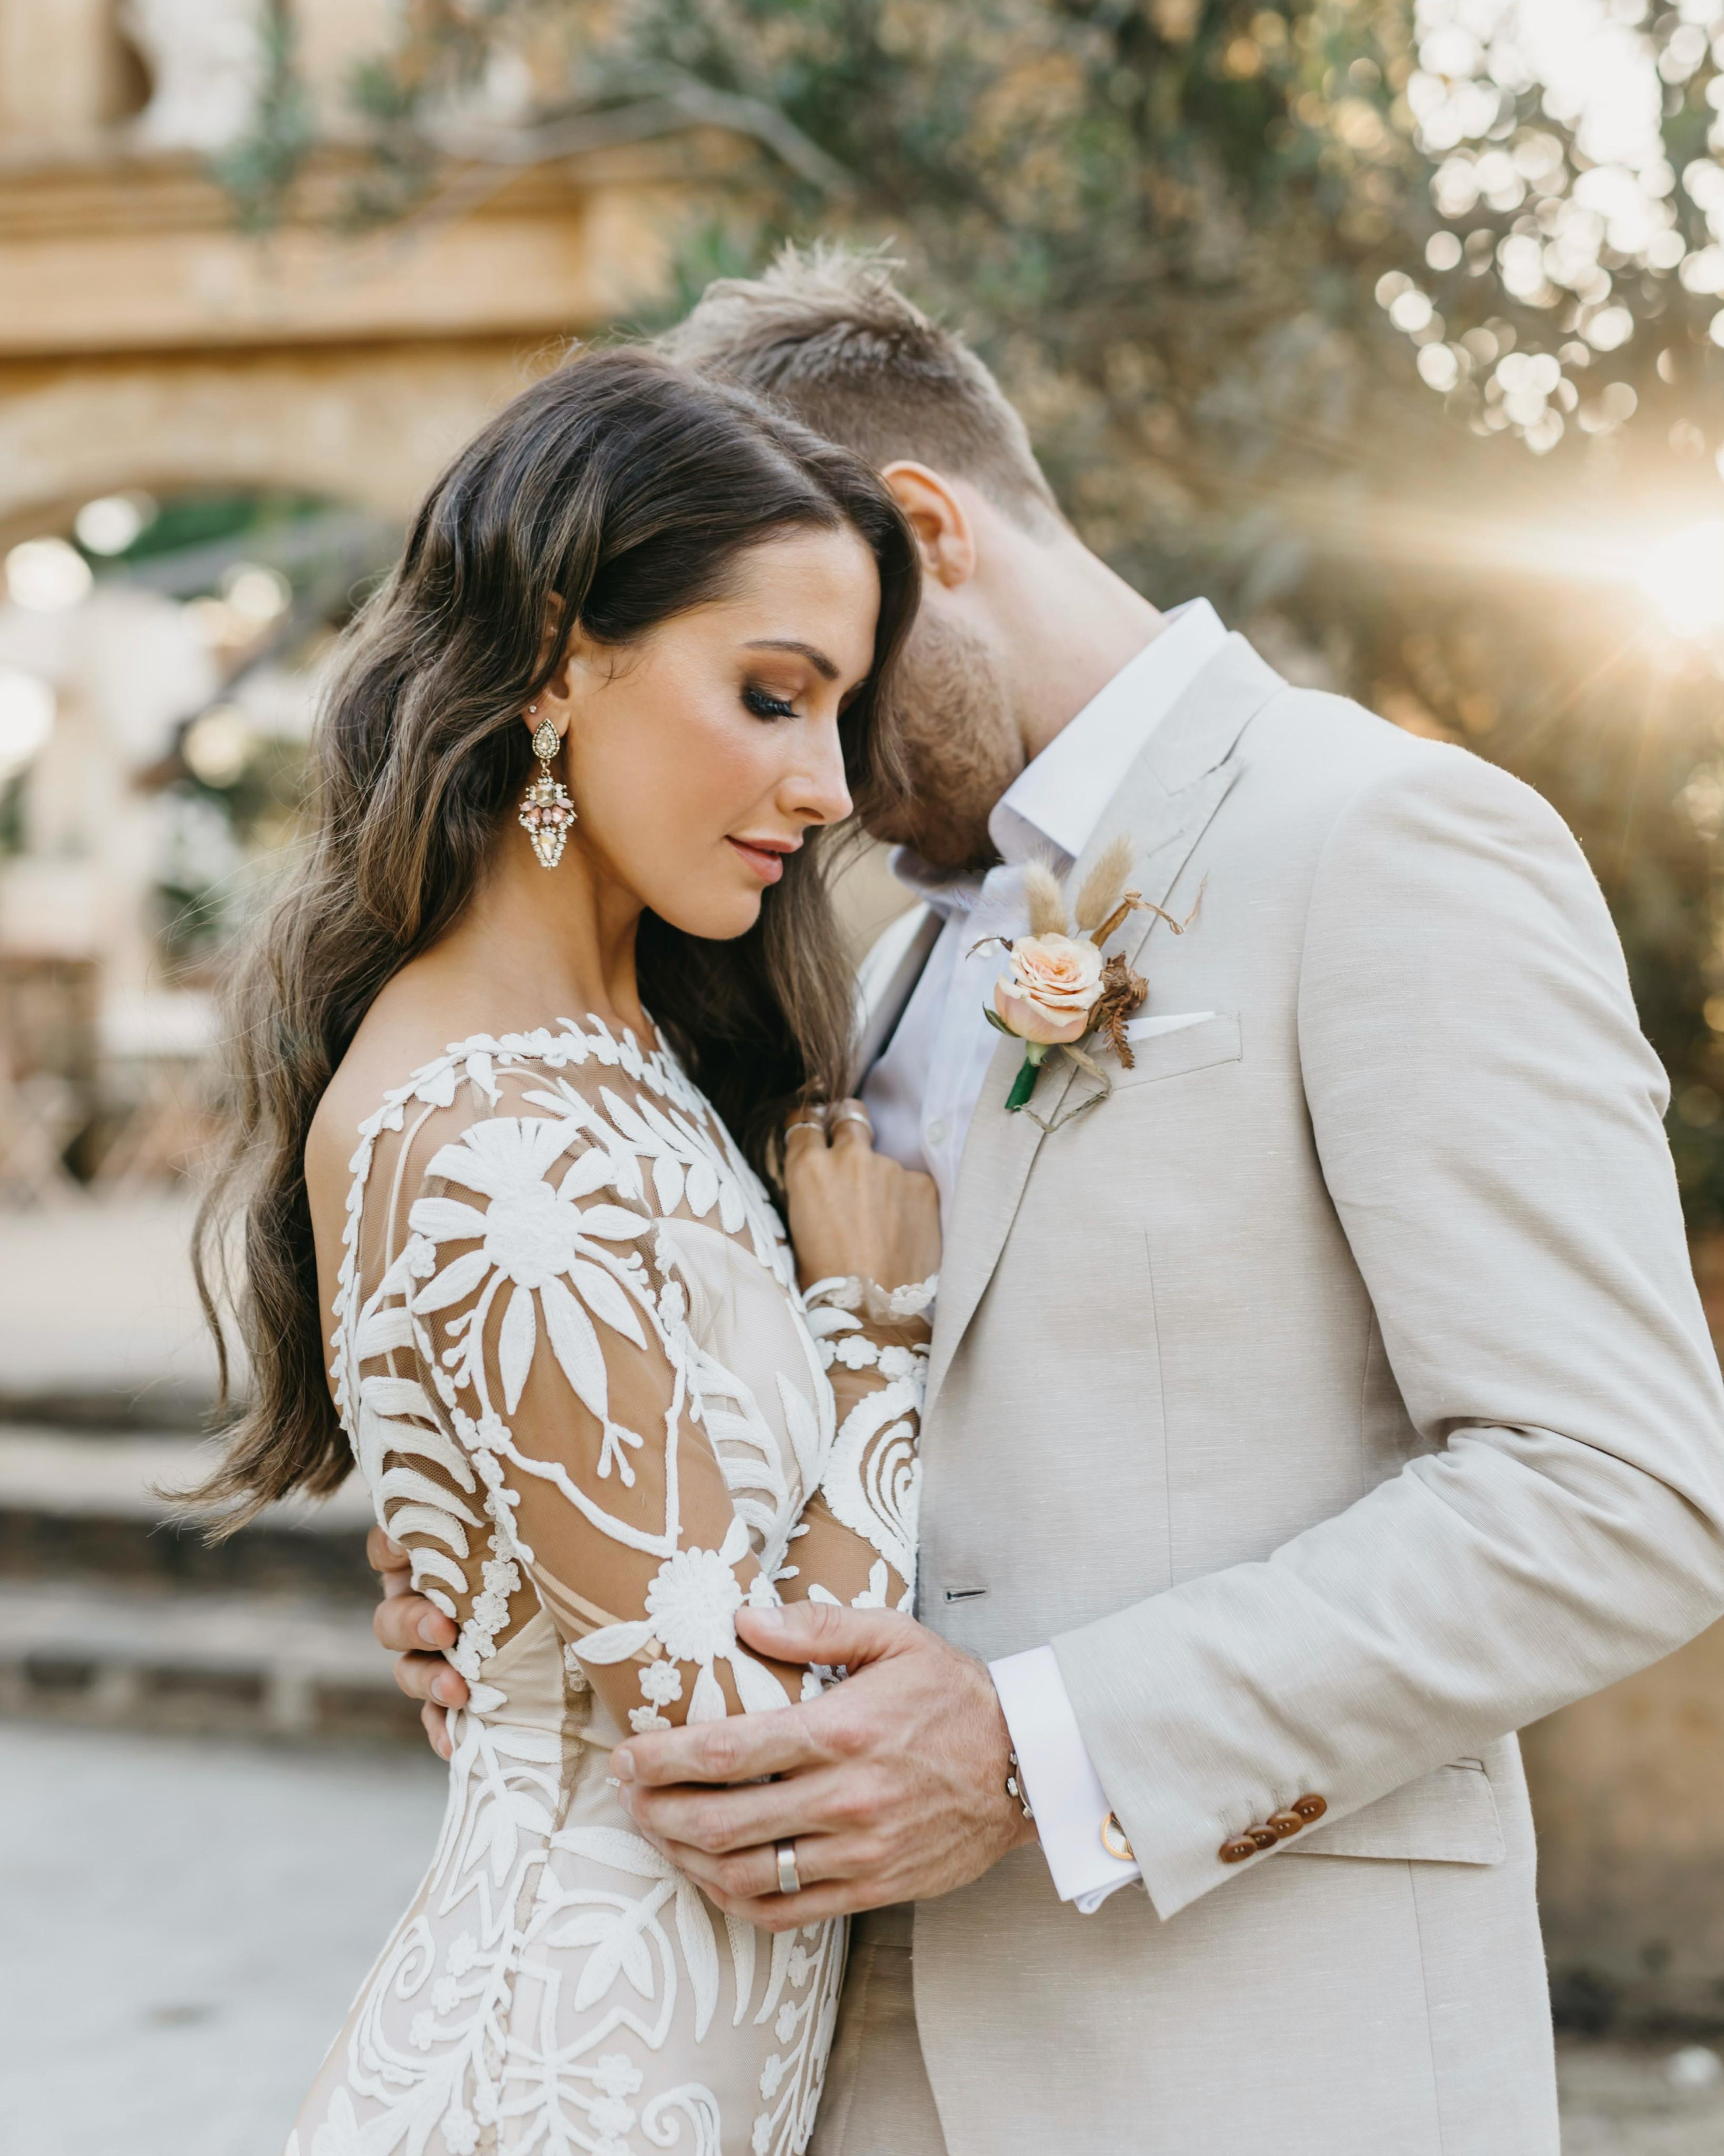 Skin4U Brides